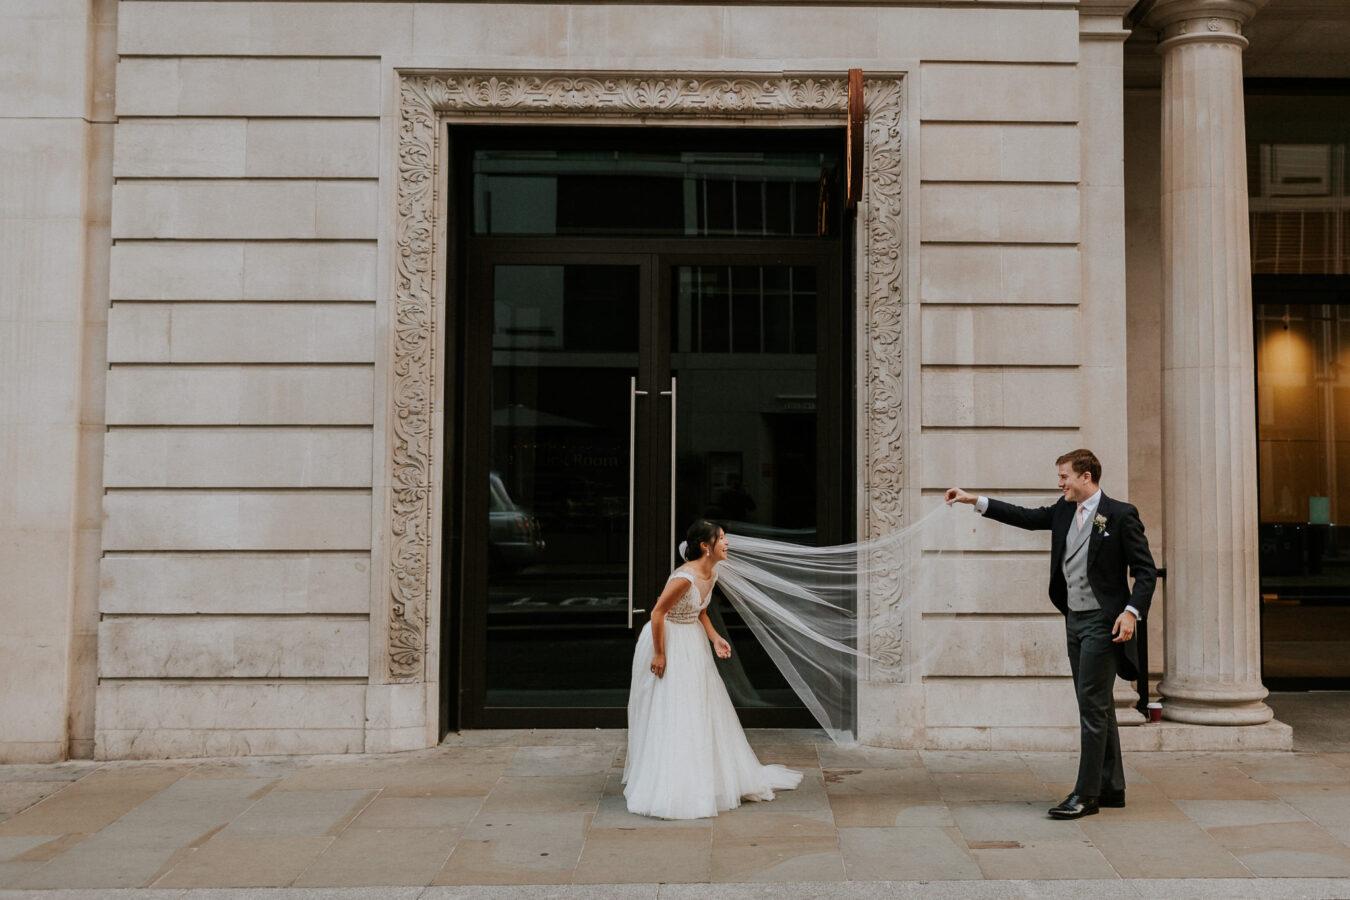 london city wedding photographer